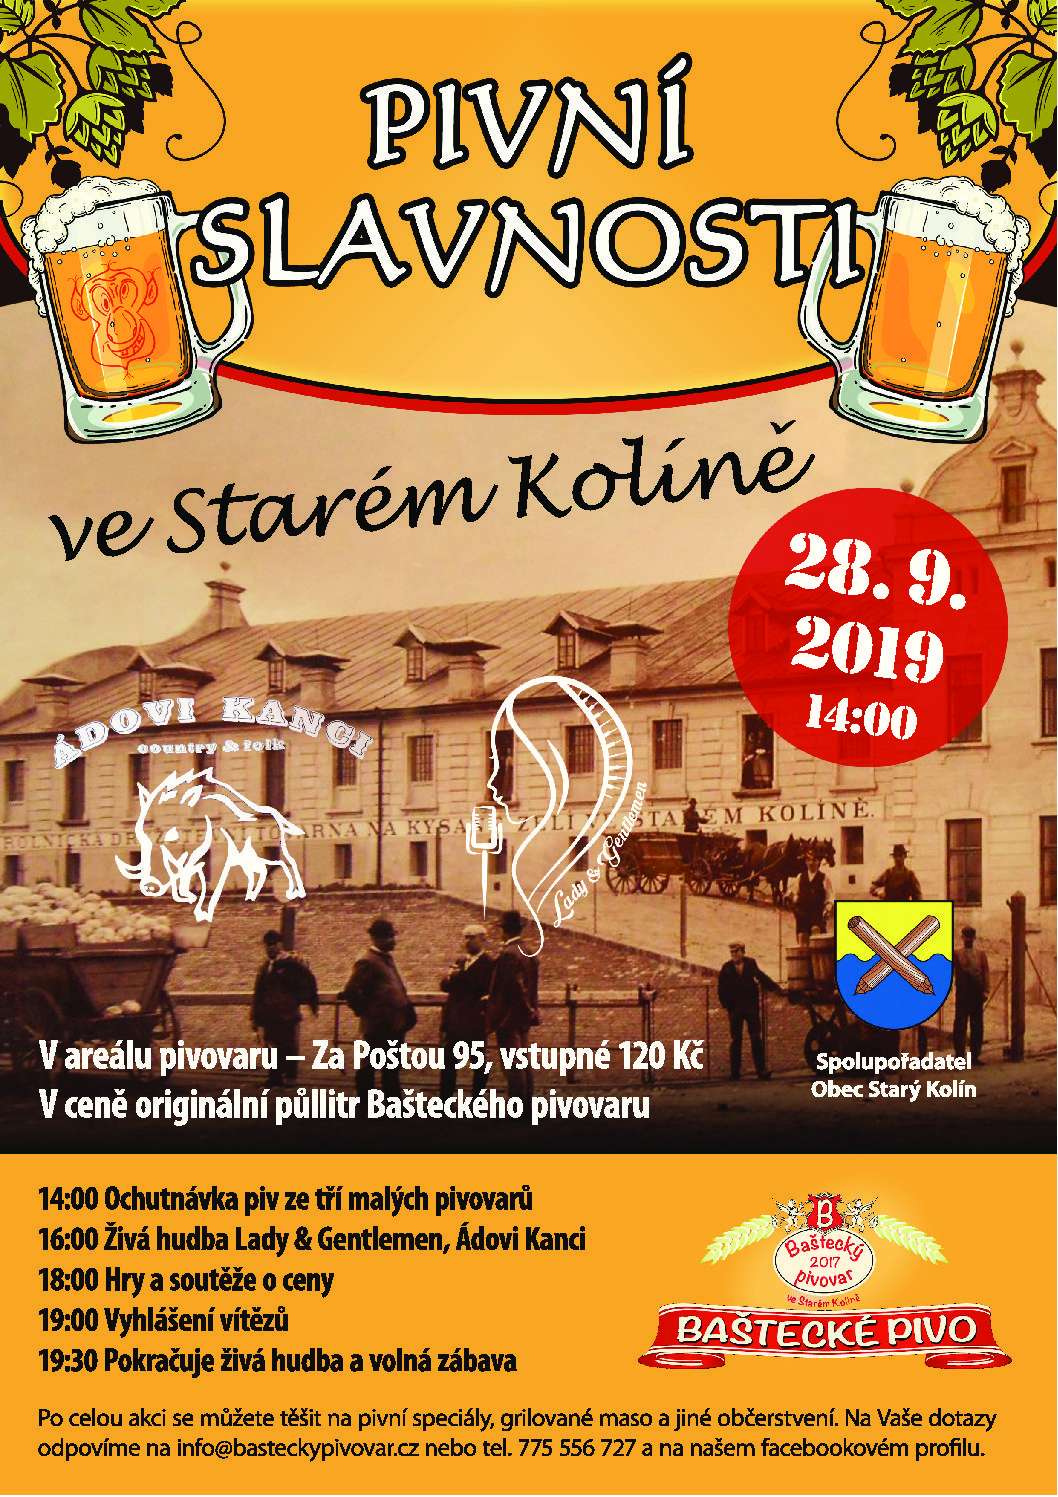 pivovari-pivovary-pivni-akce-slavnosti-piva-v-basteckem-pivovaru-2016